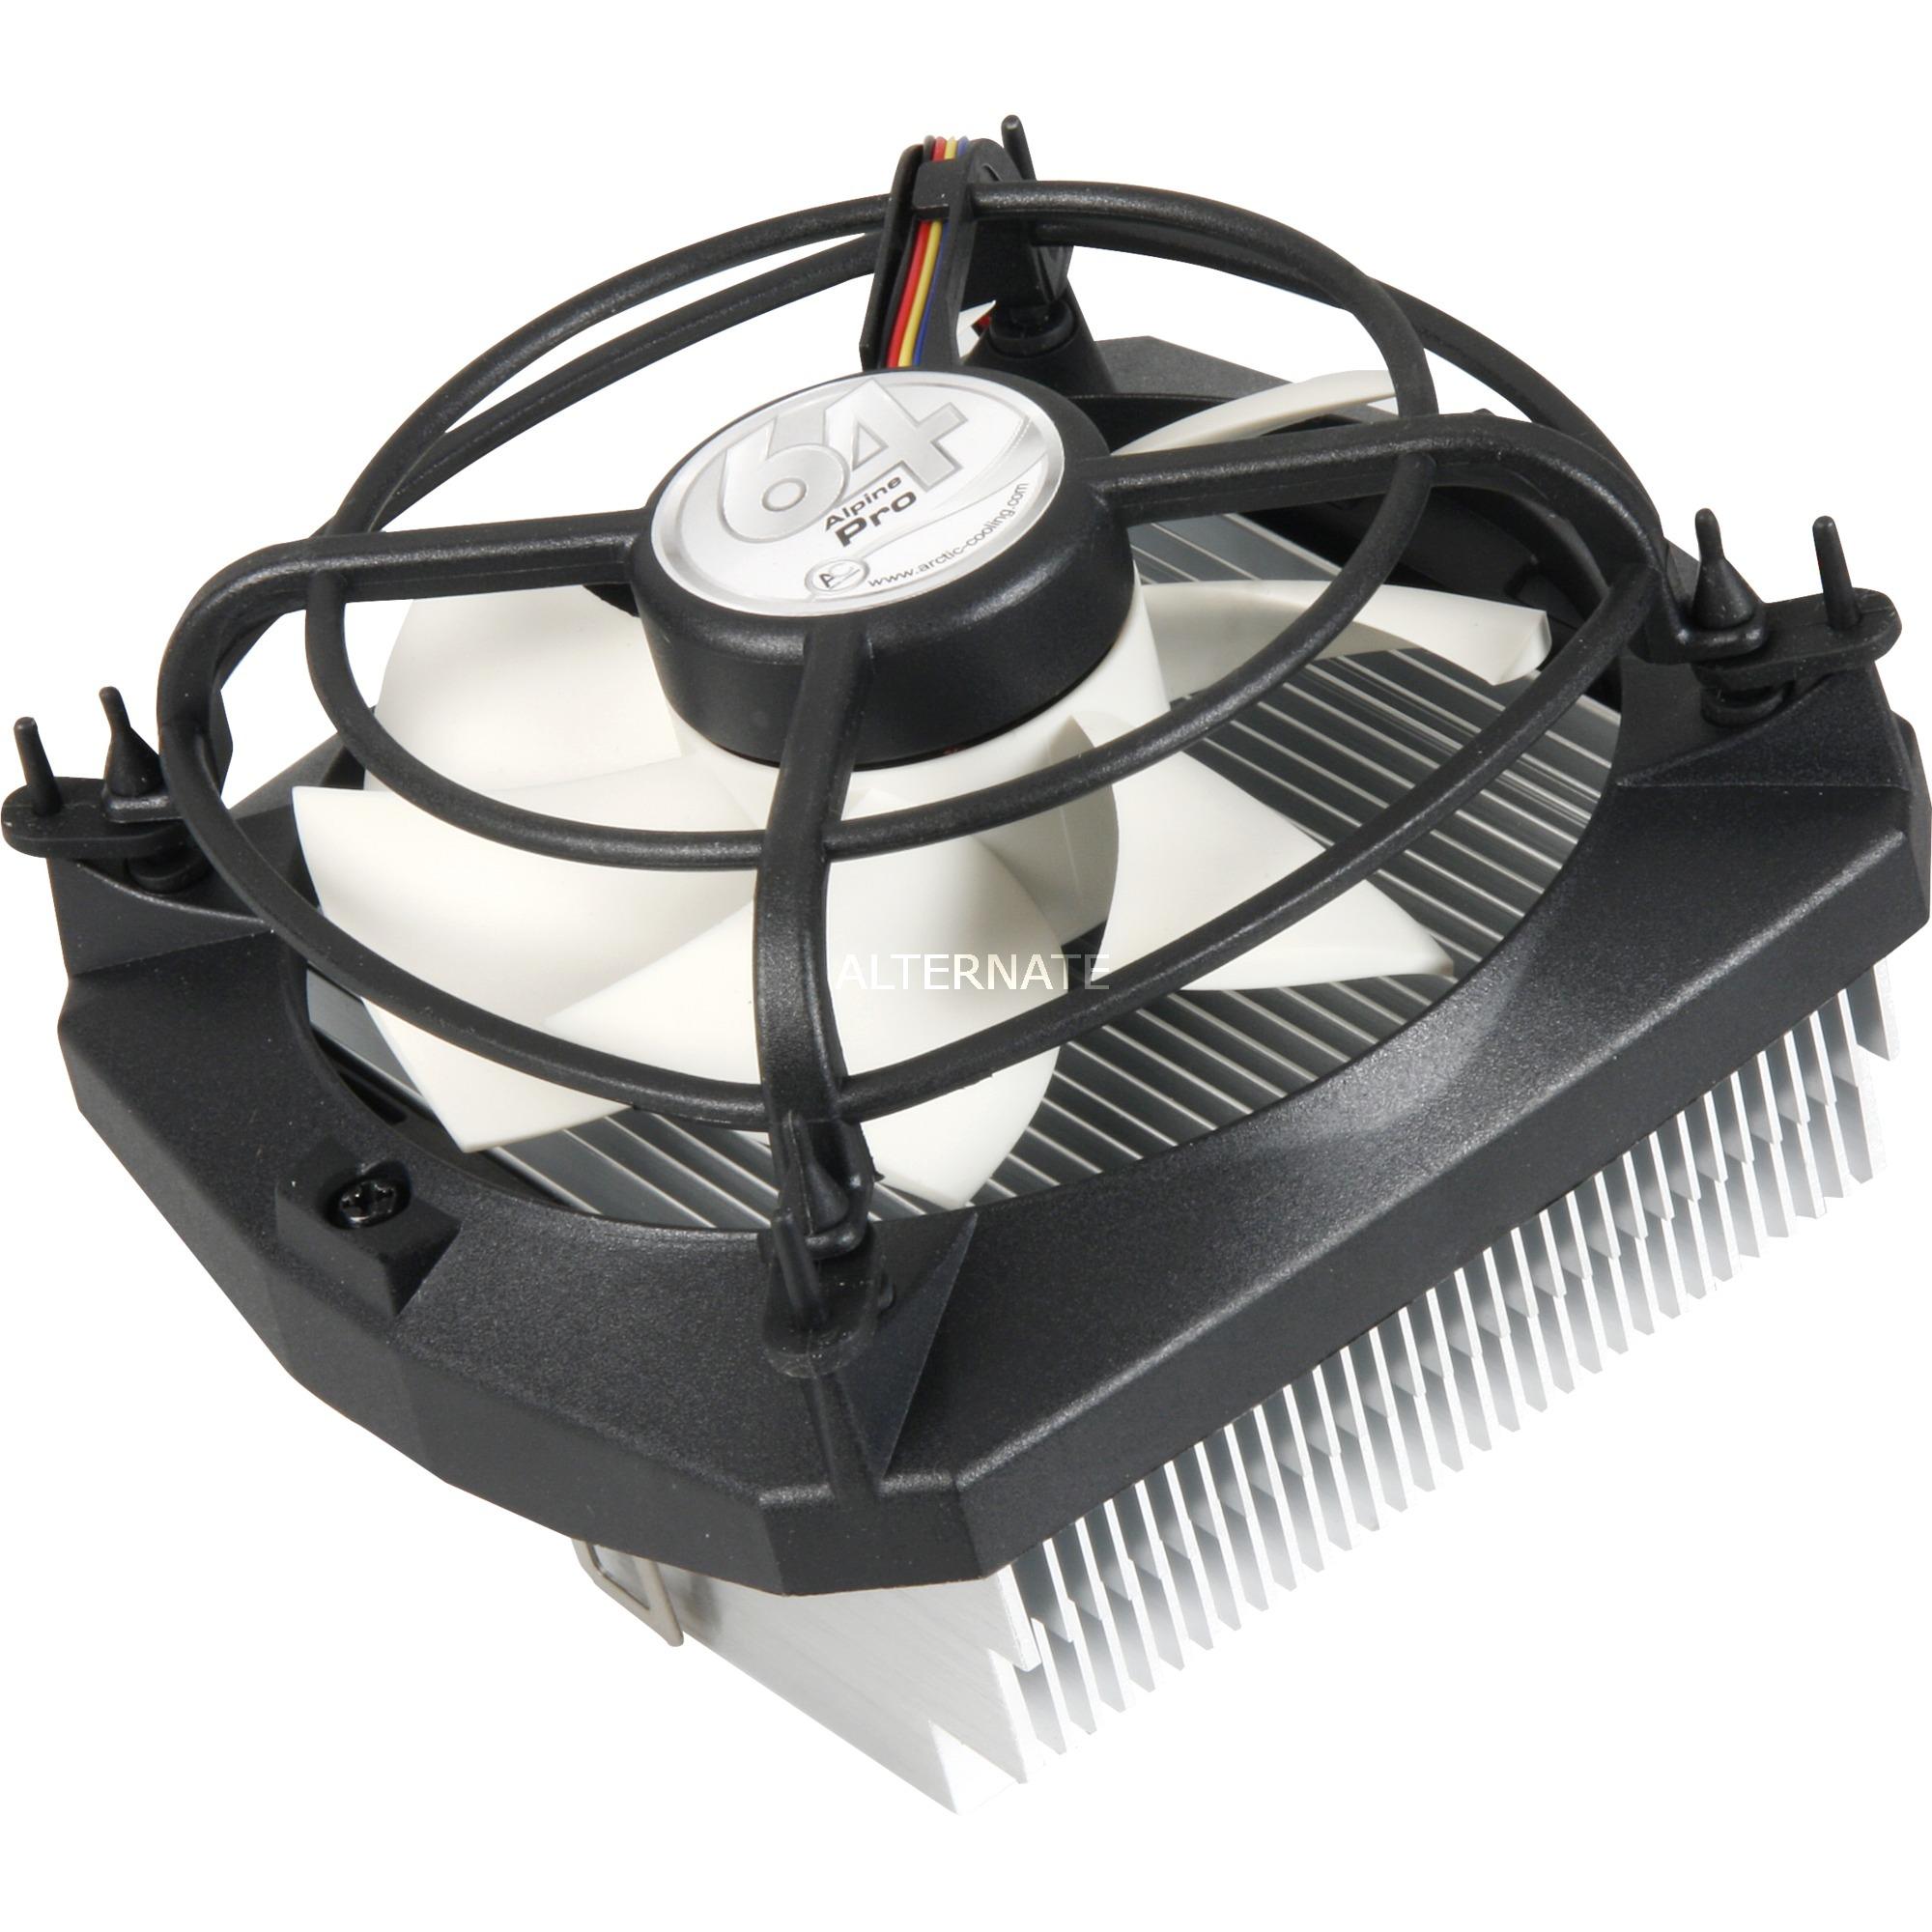 Alpine 64 PRO Rev.2 Procesador Enfriador, Disipador de CPU